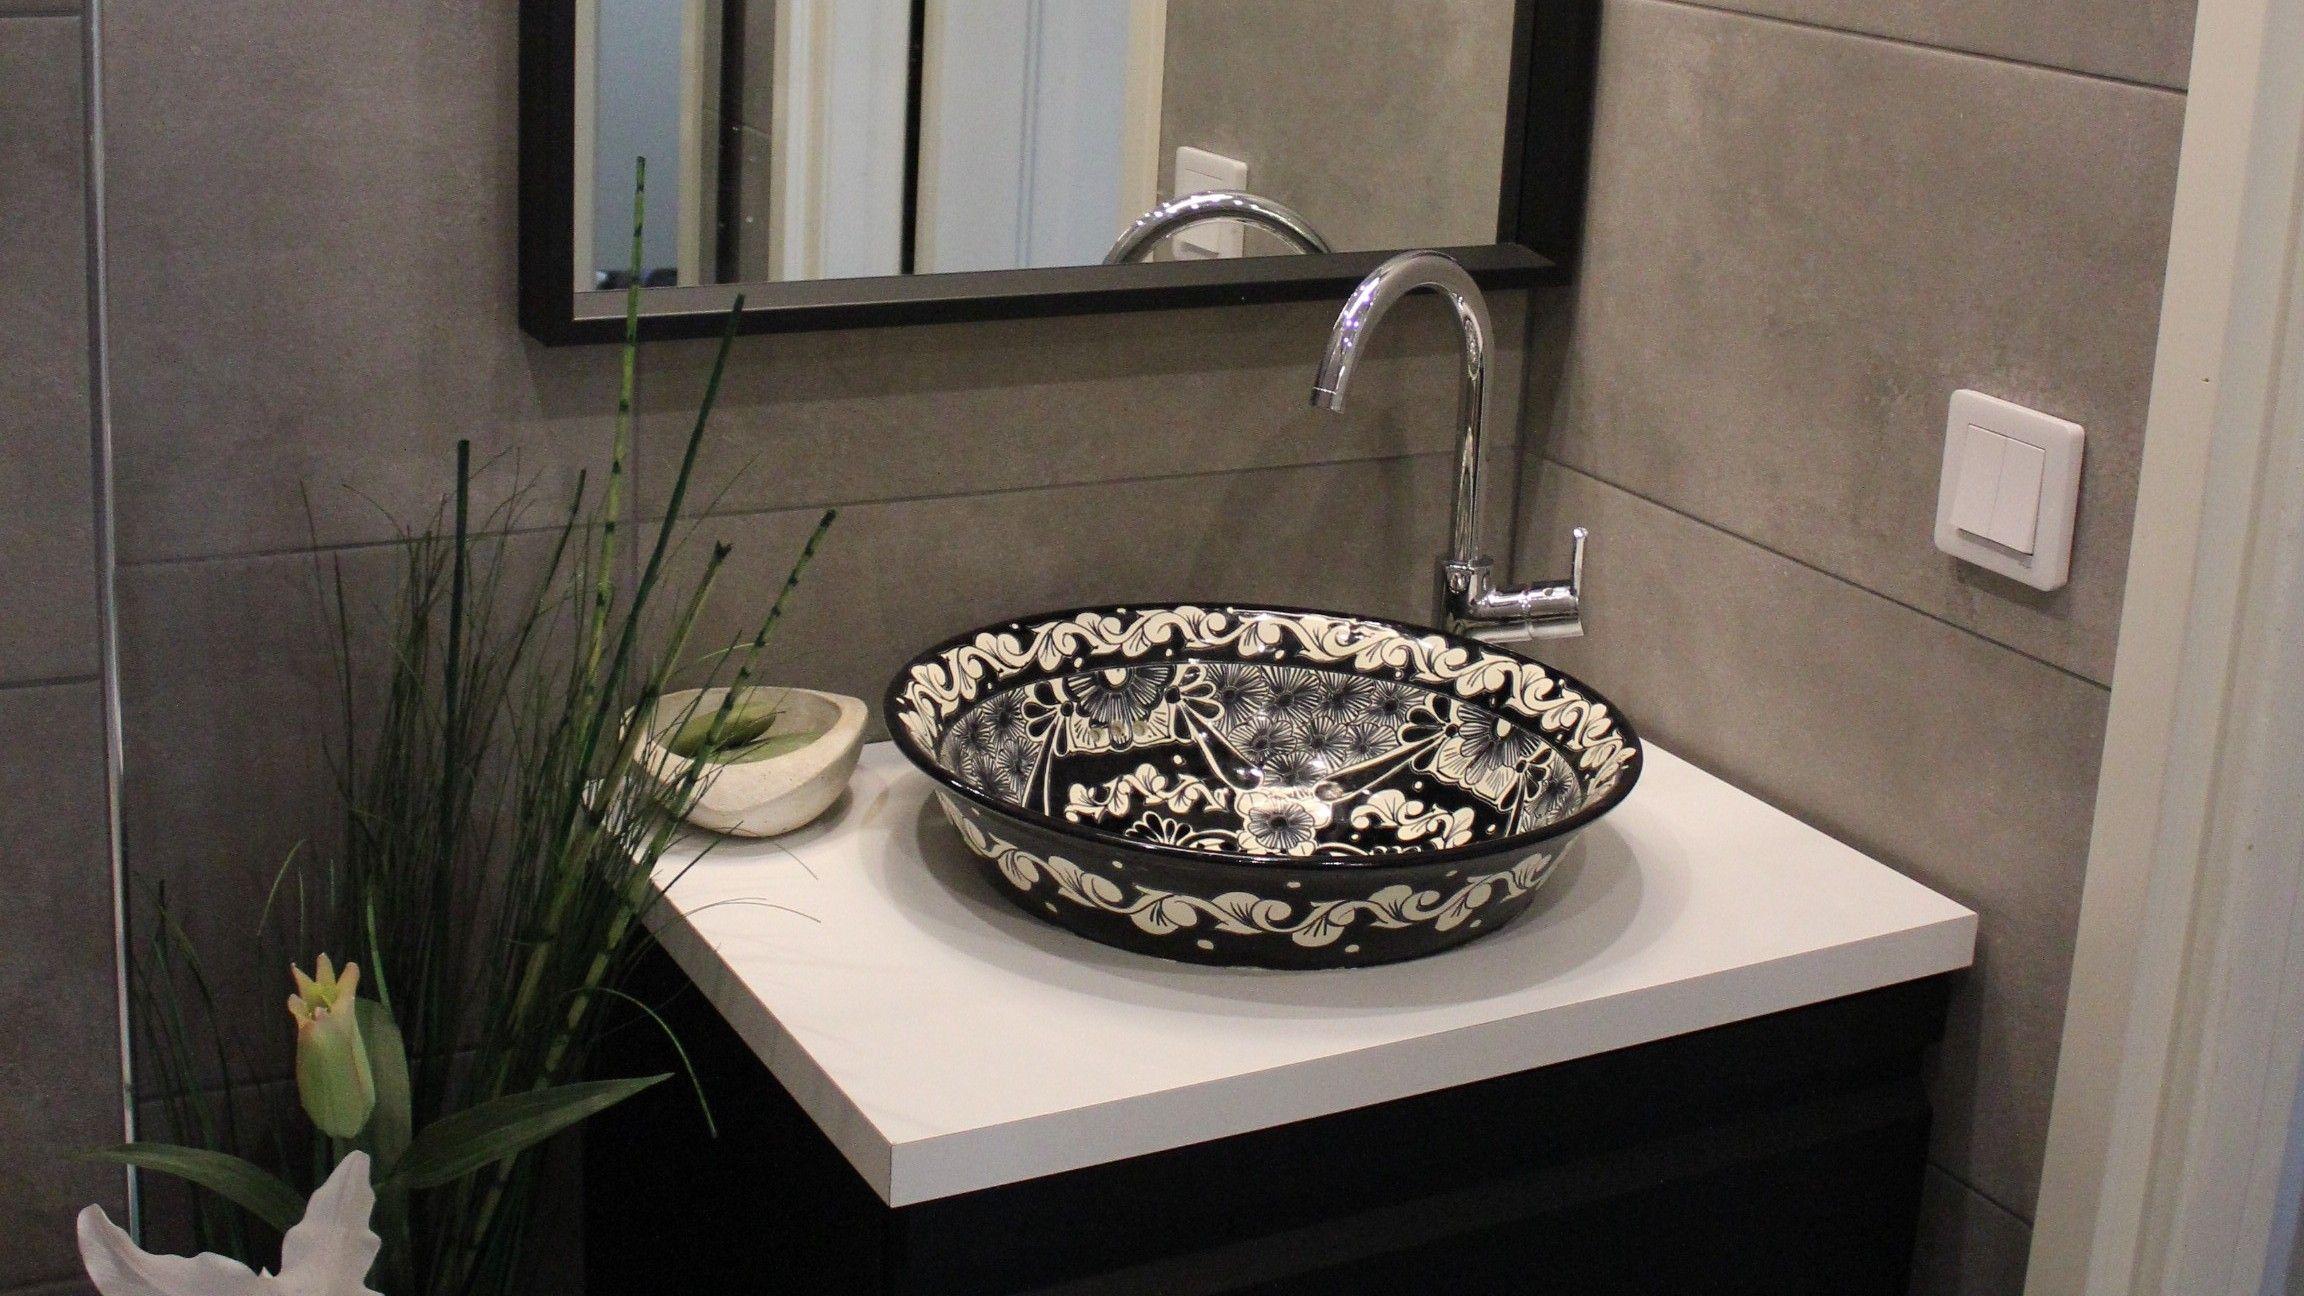 Mexikanische Waschbecken Badezimmer Ideen Szchwarz Talavera Waschbecken Aus Mexiko Haus Badezimmer Design Modern Mexikanische Waschbecken Bad Umywalka